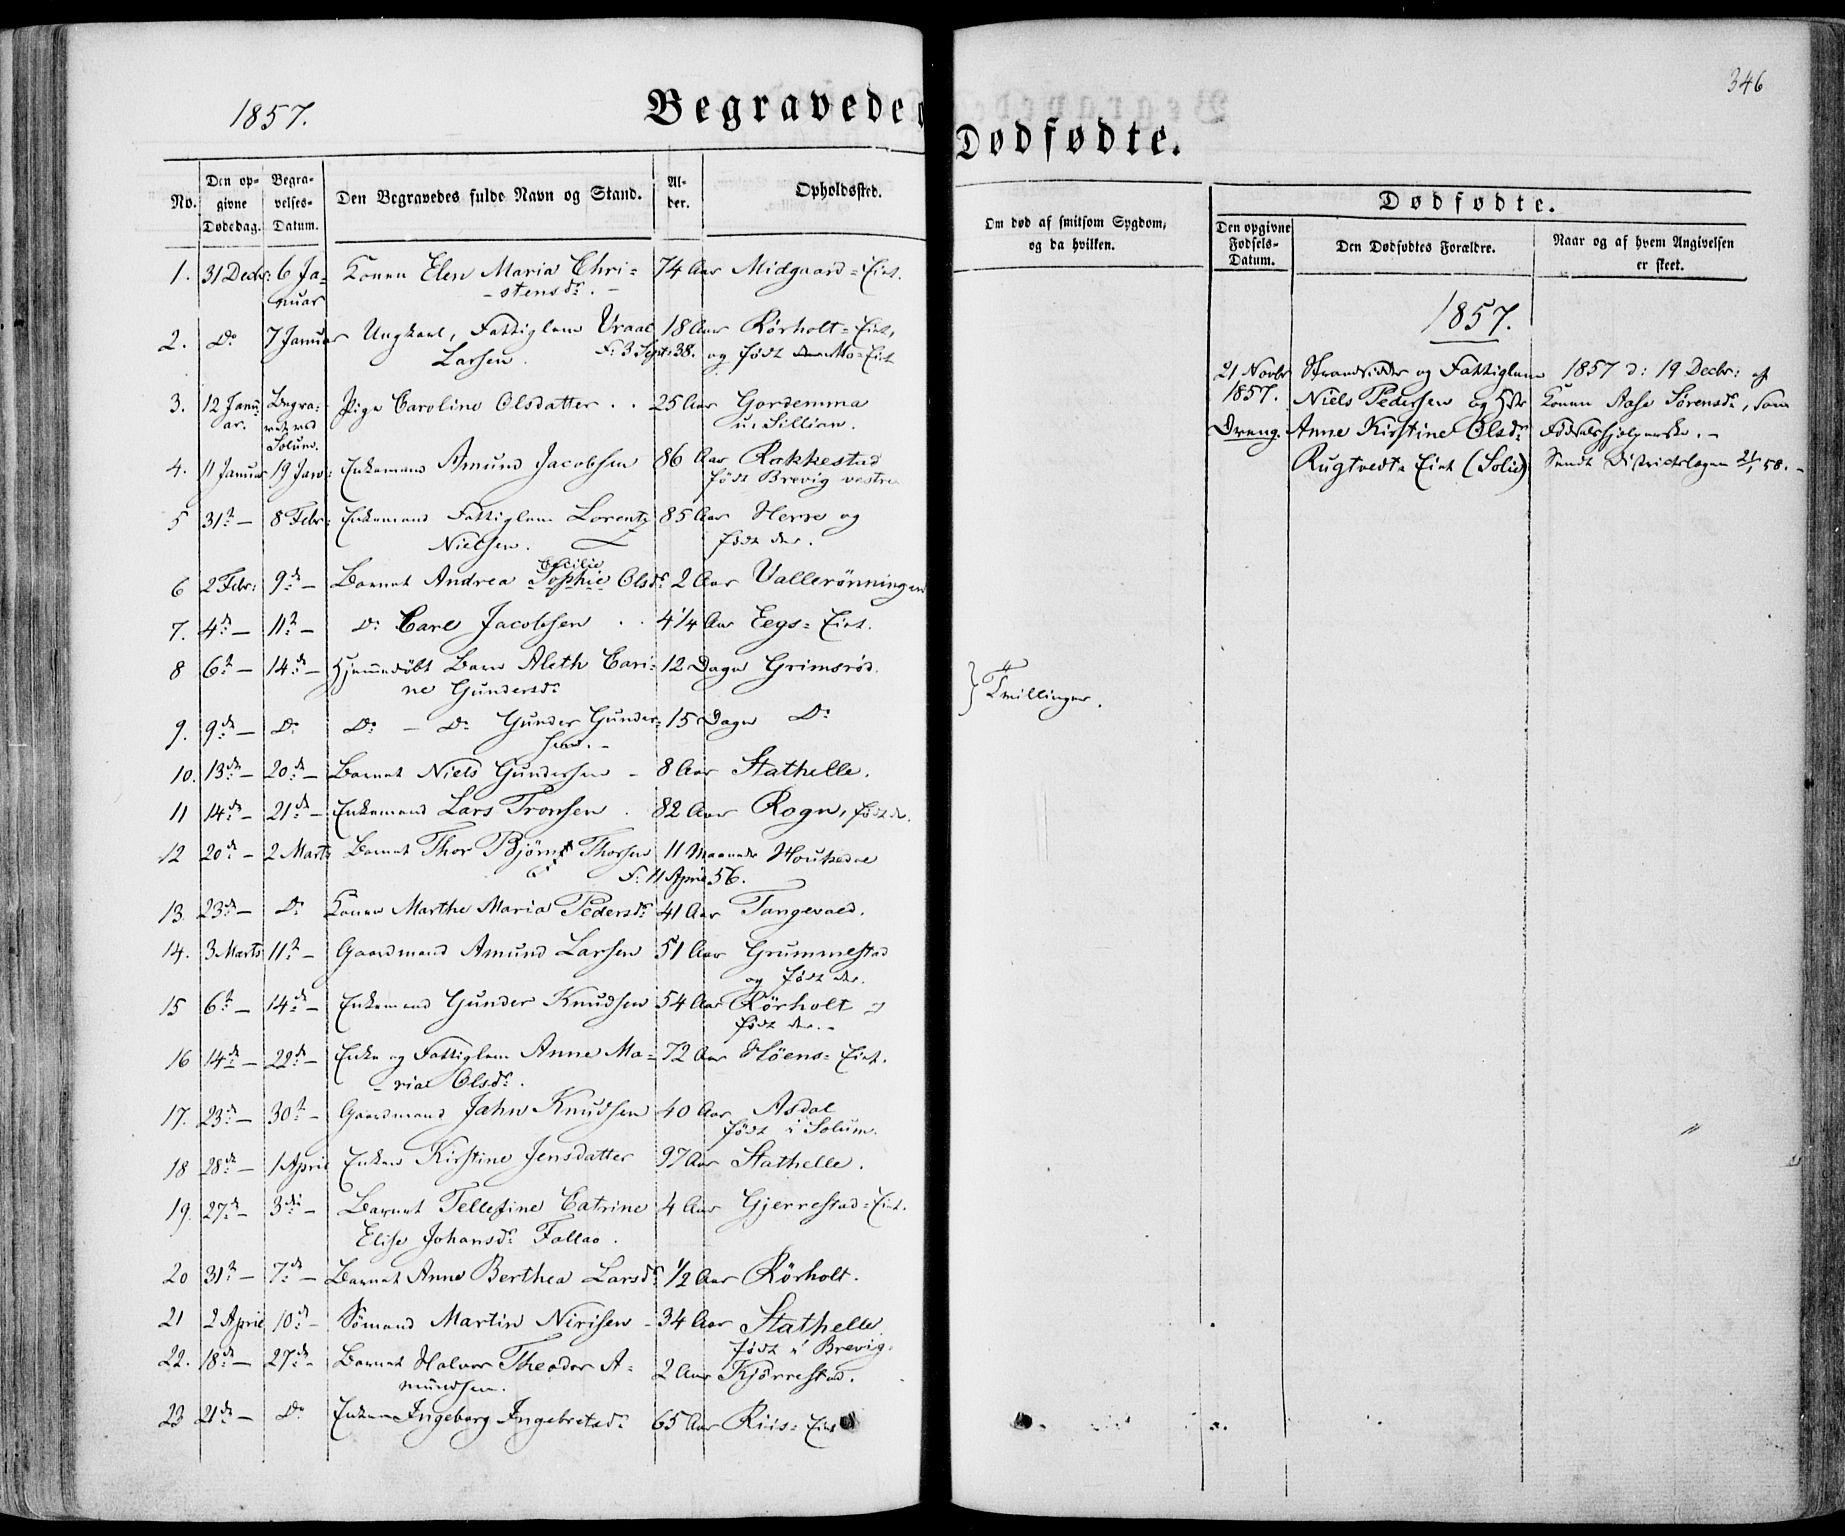 SAKO, Bamble kirkebøker, F/Fa/L0005: Ministerialbok nr. I 5, 1854-1869, s. 346